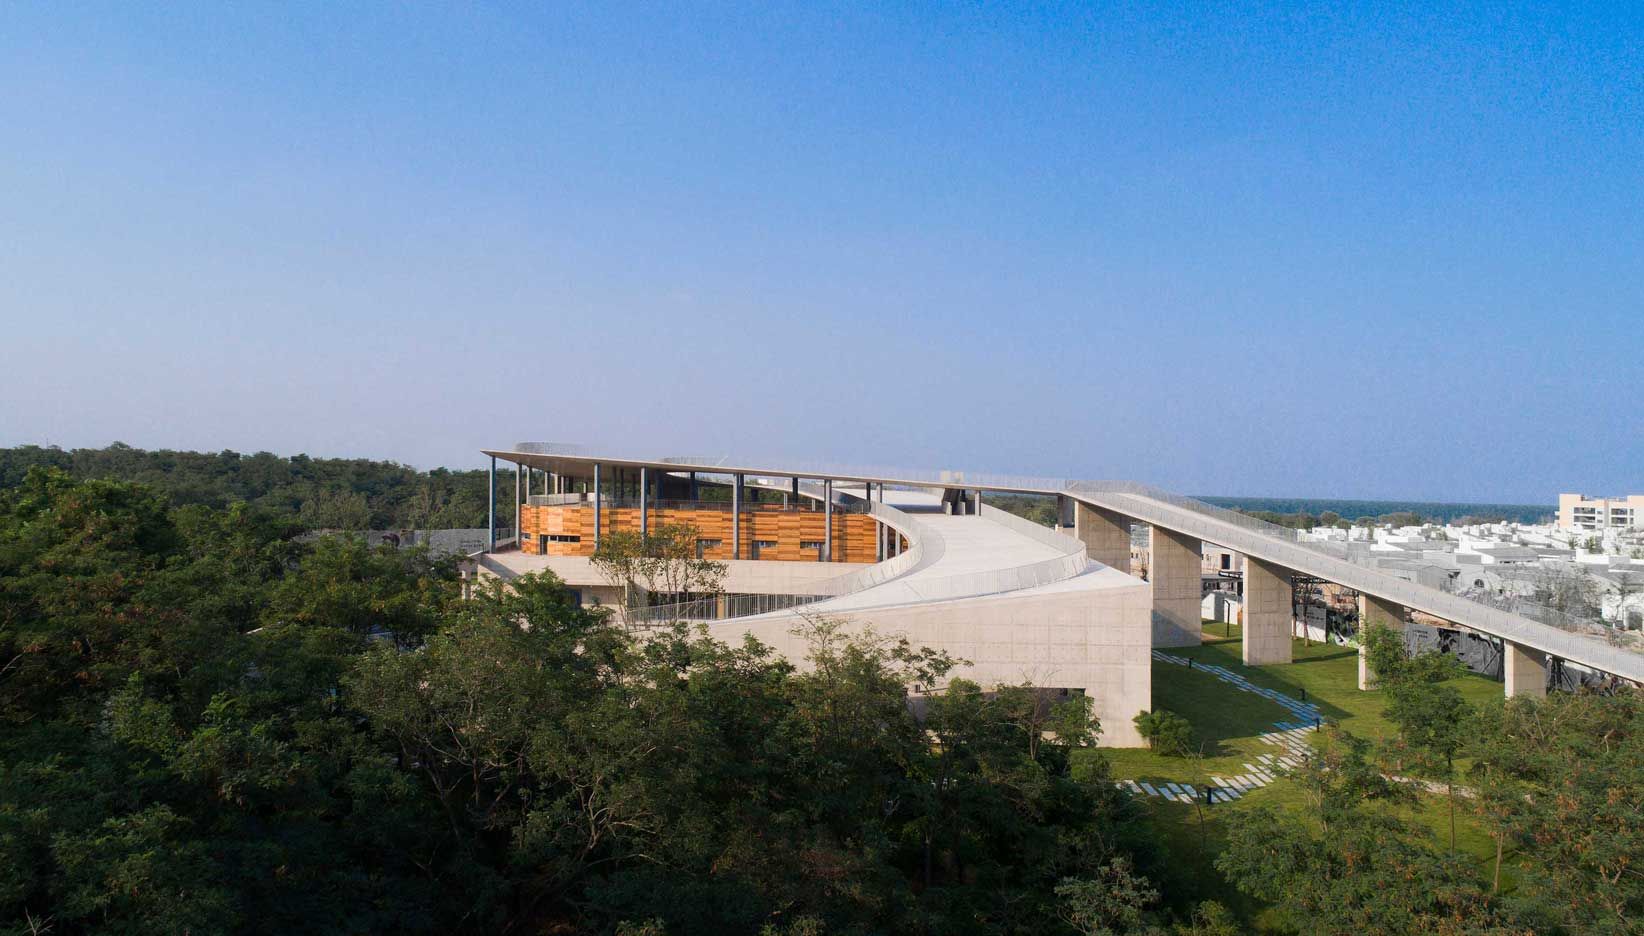 Aranya Qixing Youth Camp, projetado por Zhang Li.